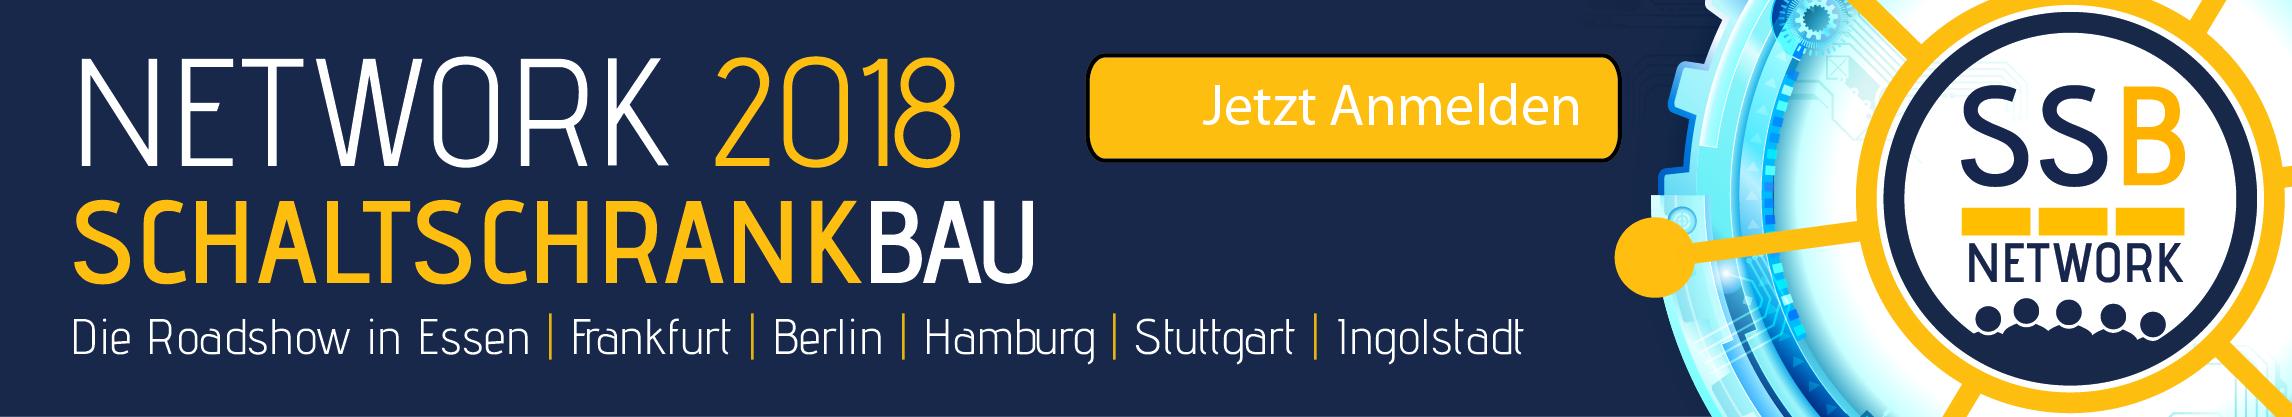 http://www.schaltschrankbau-magazin.de/network-2018/?pk_campaign=schaltschrankbau-network-2018&pk_source=iot-design-news&pk_medium=banner&pk_content=jetzt-anmelden